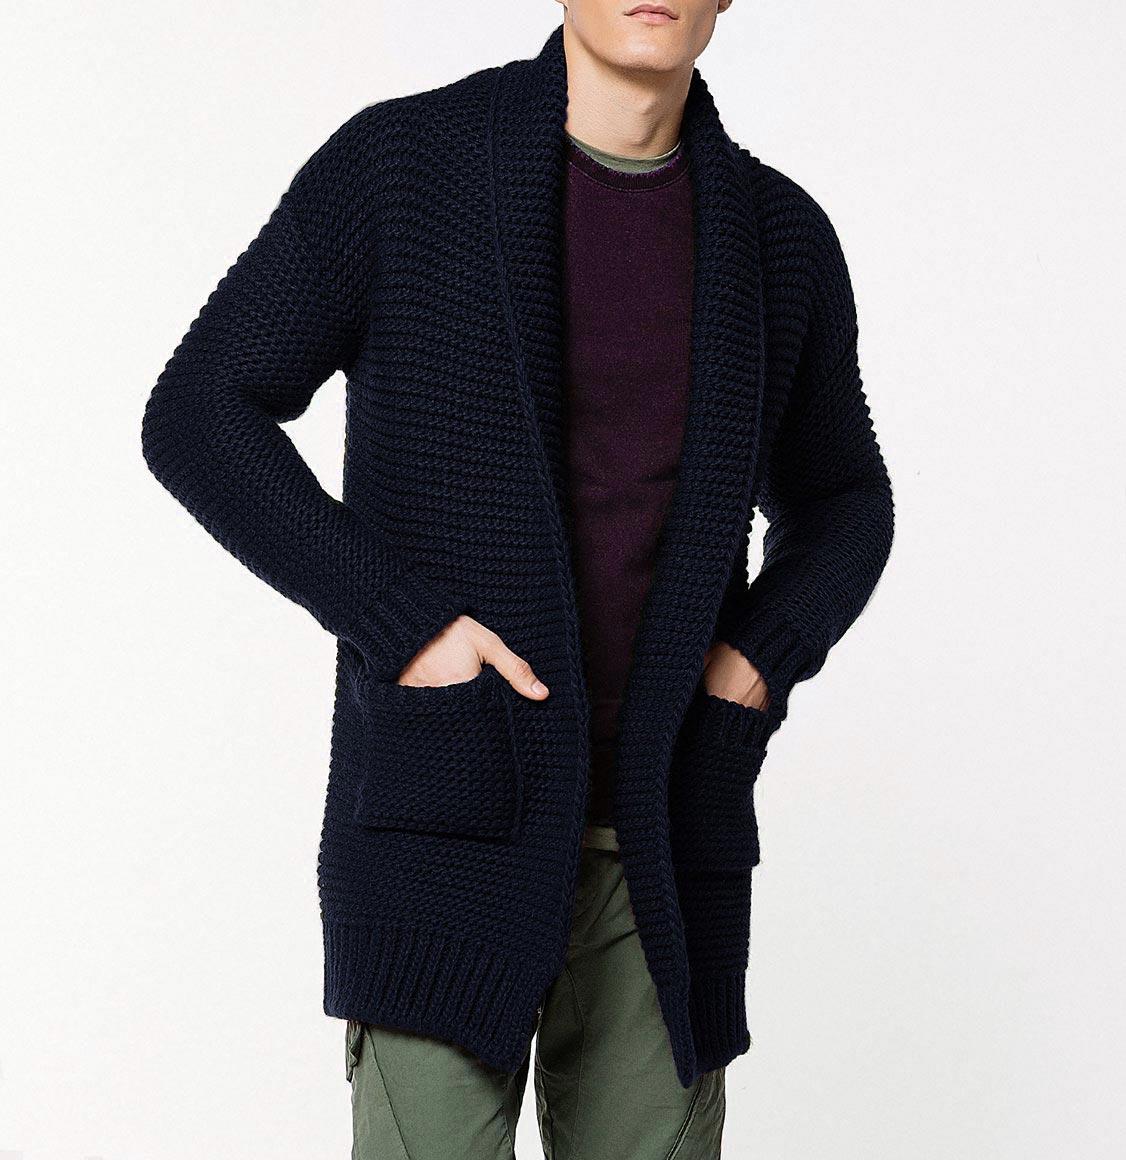 Oversized Shawl Collar Wool Blend Cardigan Navy Blue